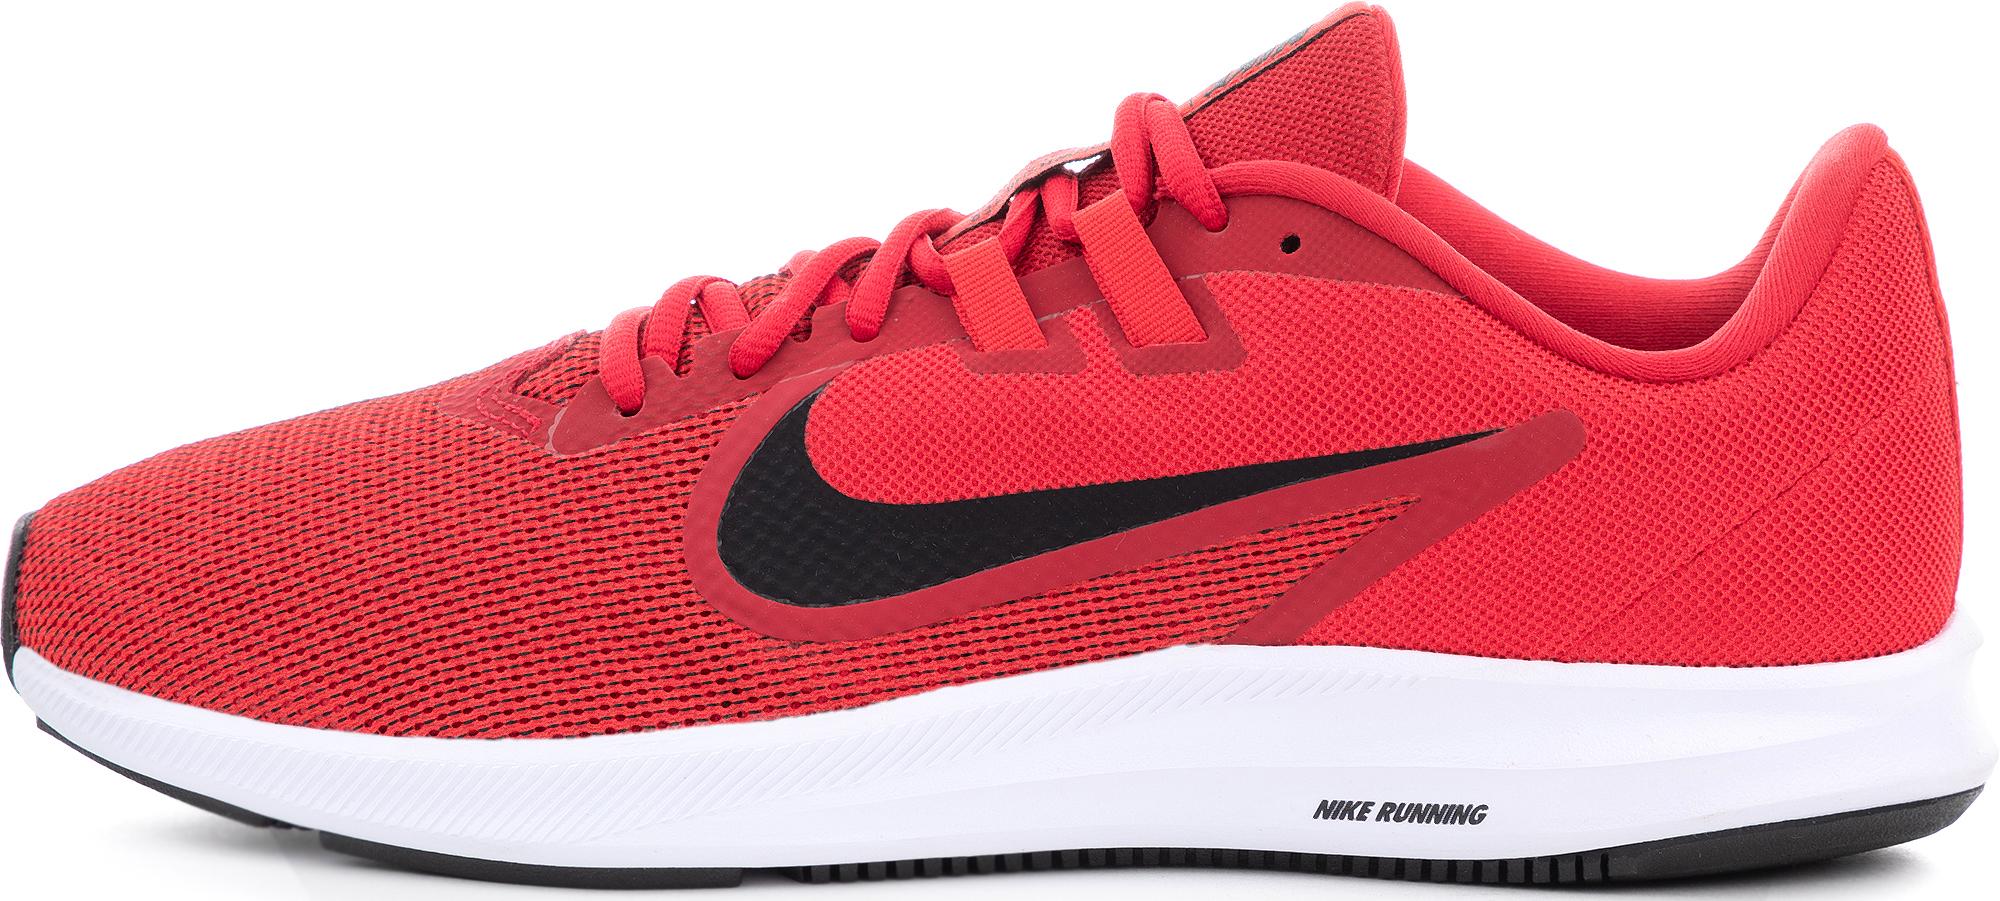 Nike Кроссовки мужские Nike Downshifter 9, размер 45